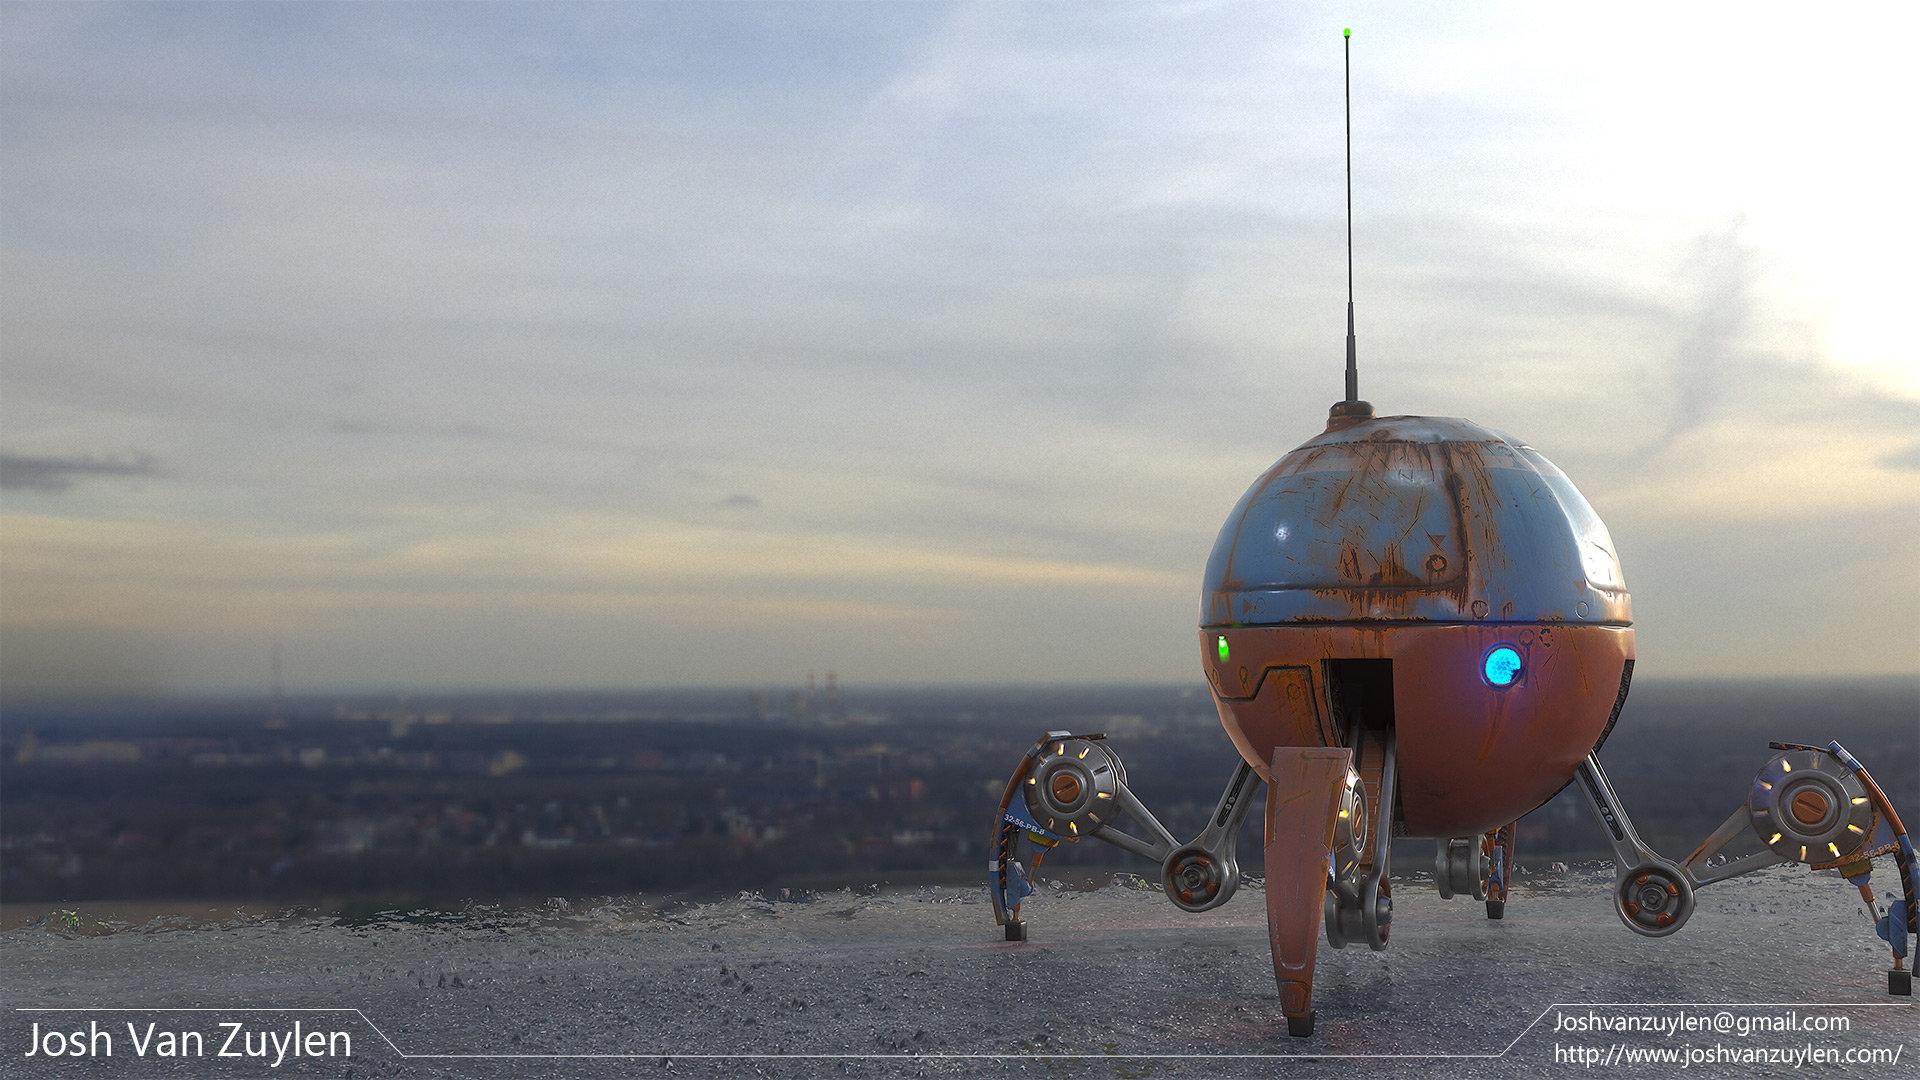 josh-van-zuylen-little-robot-final-4.jpg?1436955585